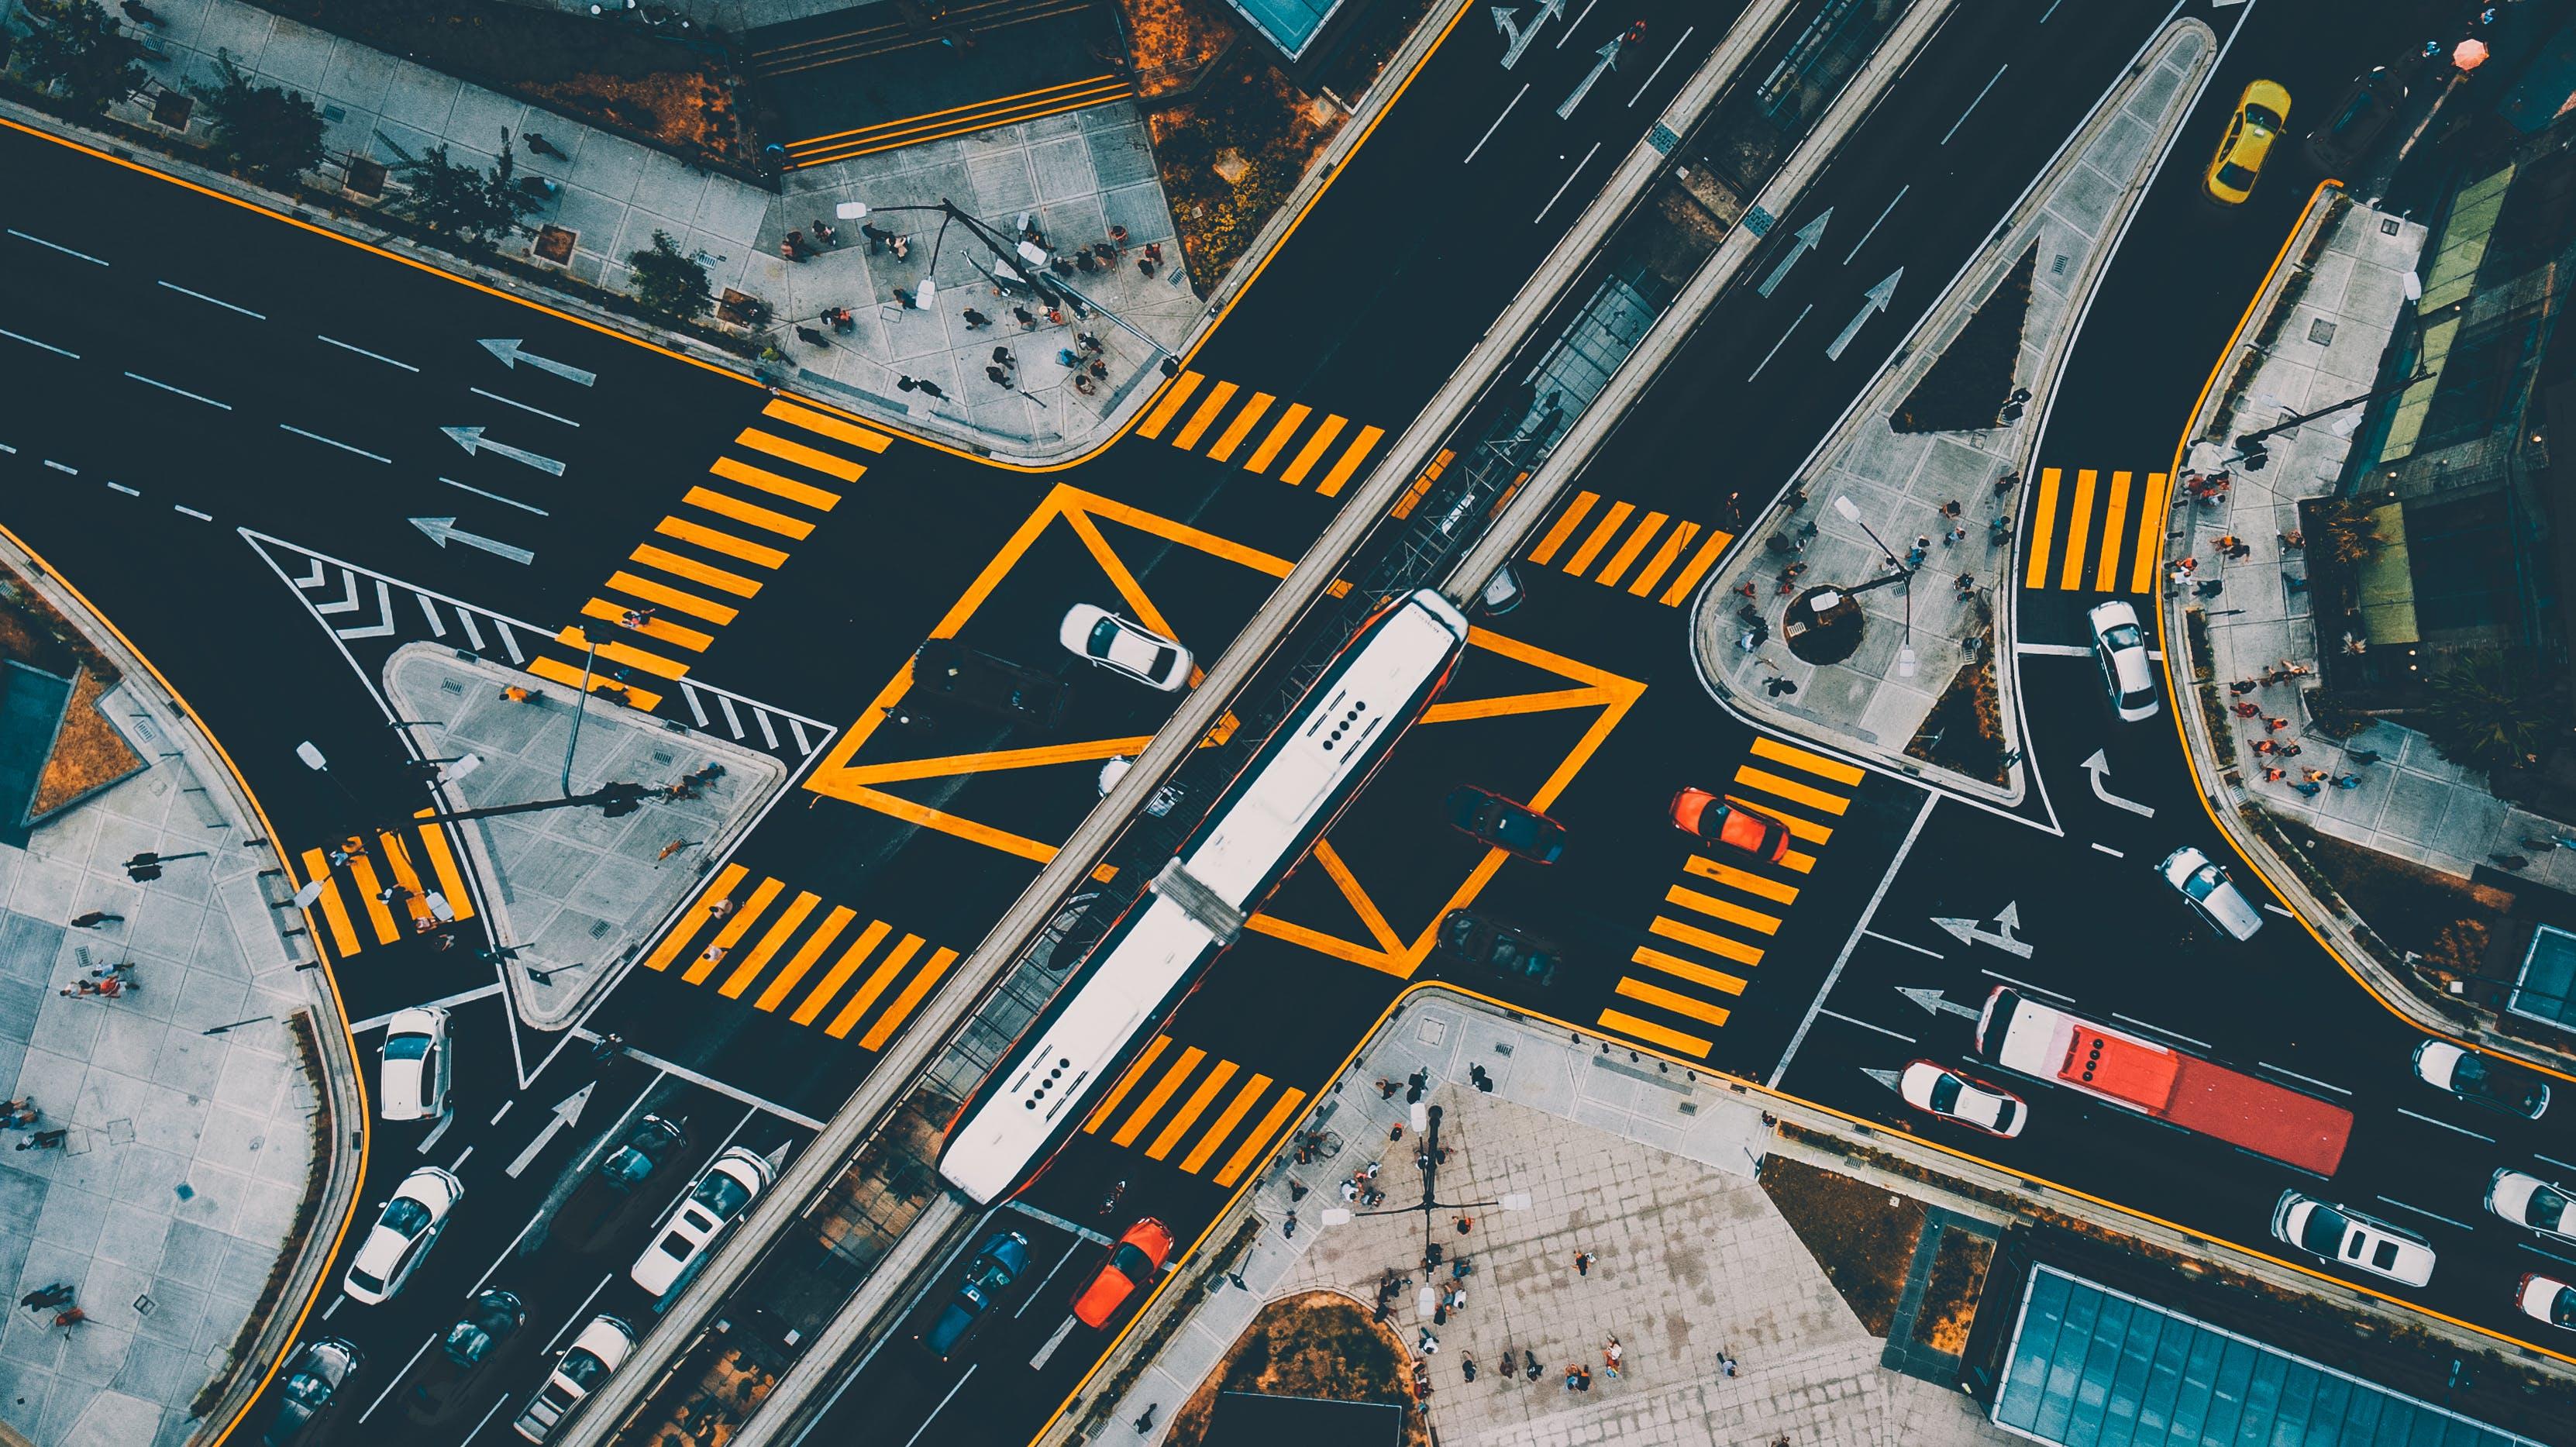 Foto stok gratis jalanan, jalur penyeberangan pejalan kaki, kehidupan kota, kendaraan